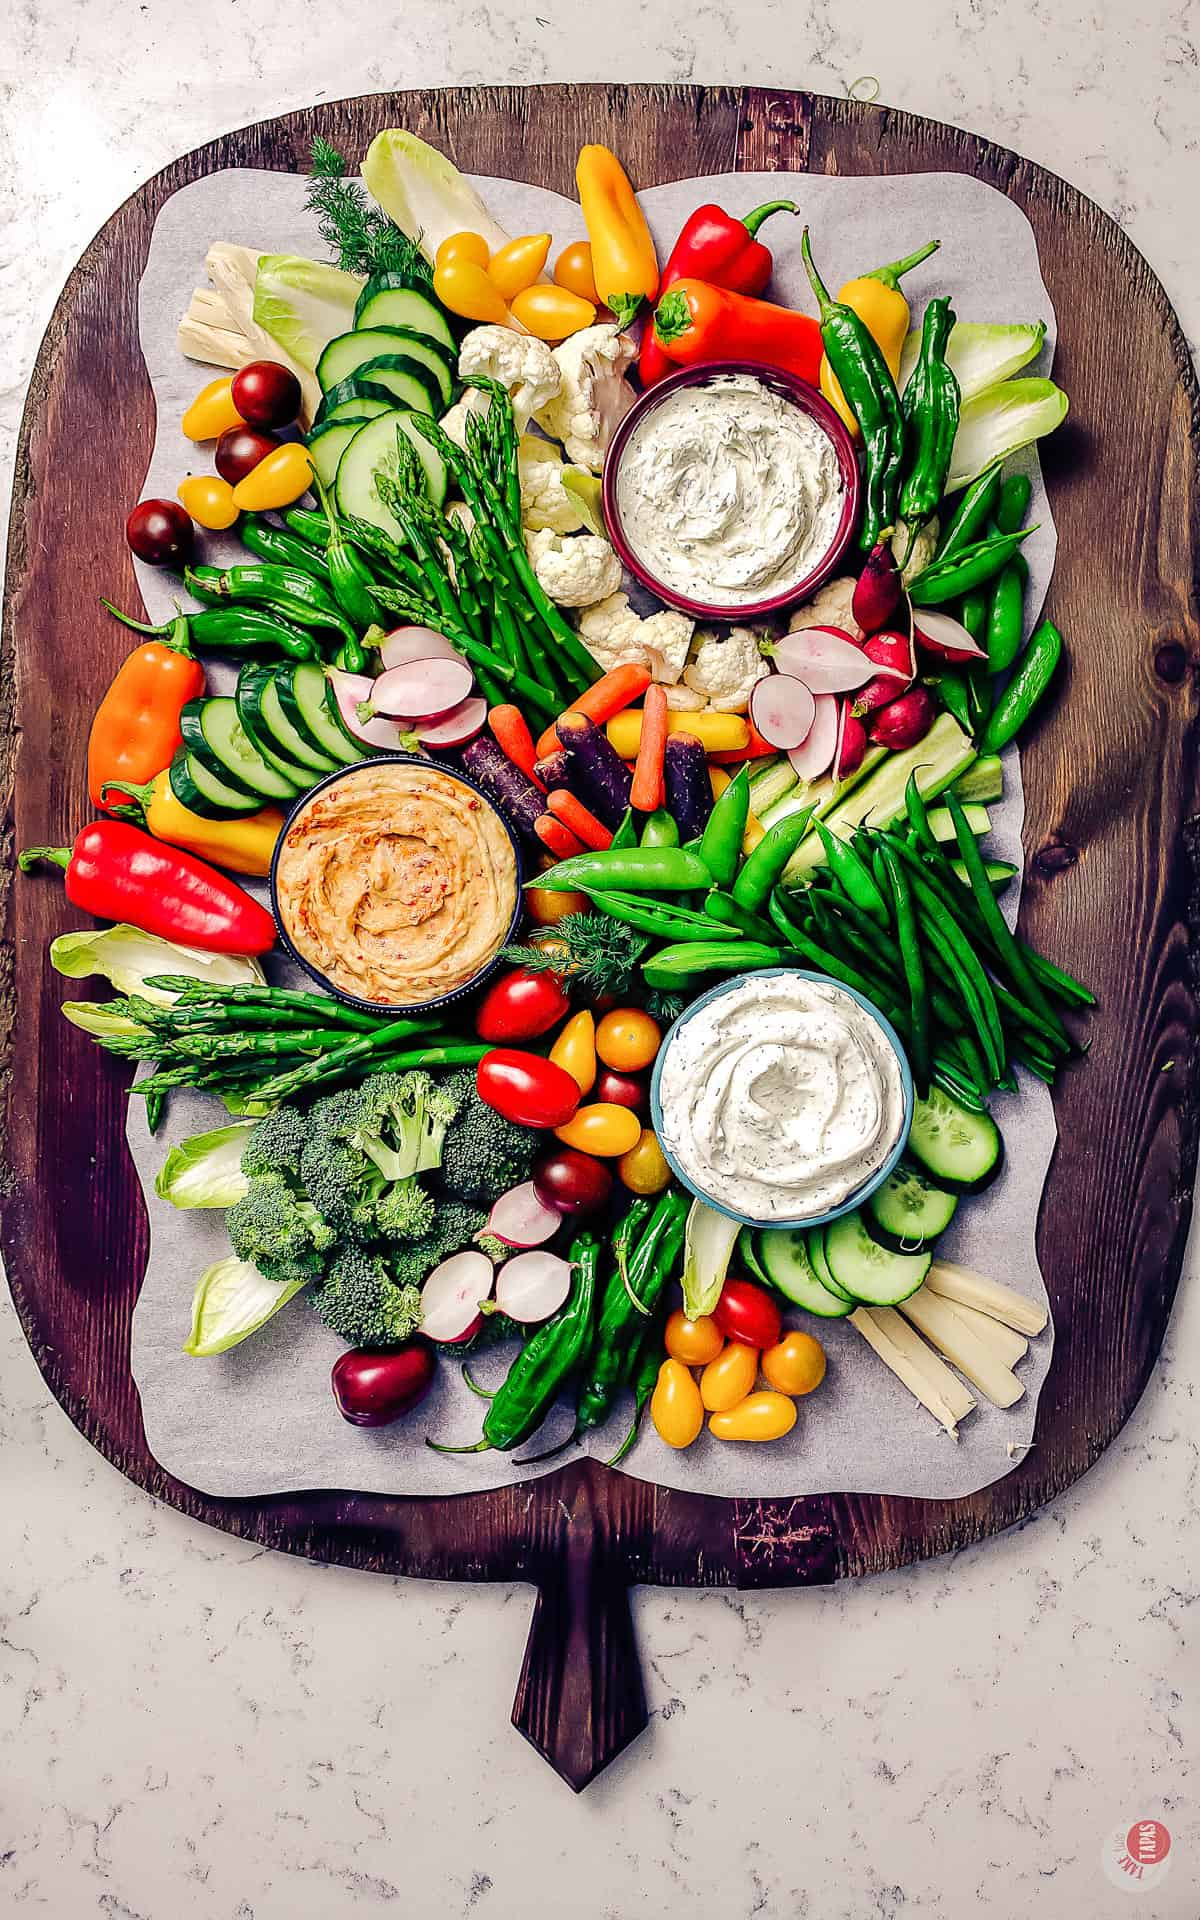 an overhead view of a vegetable platter